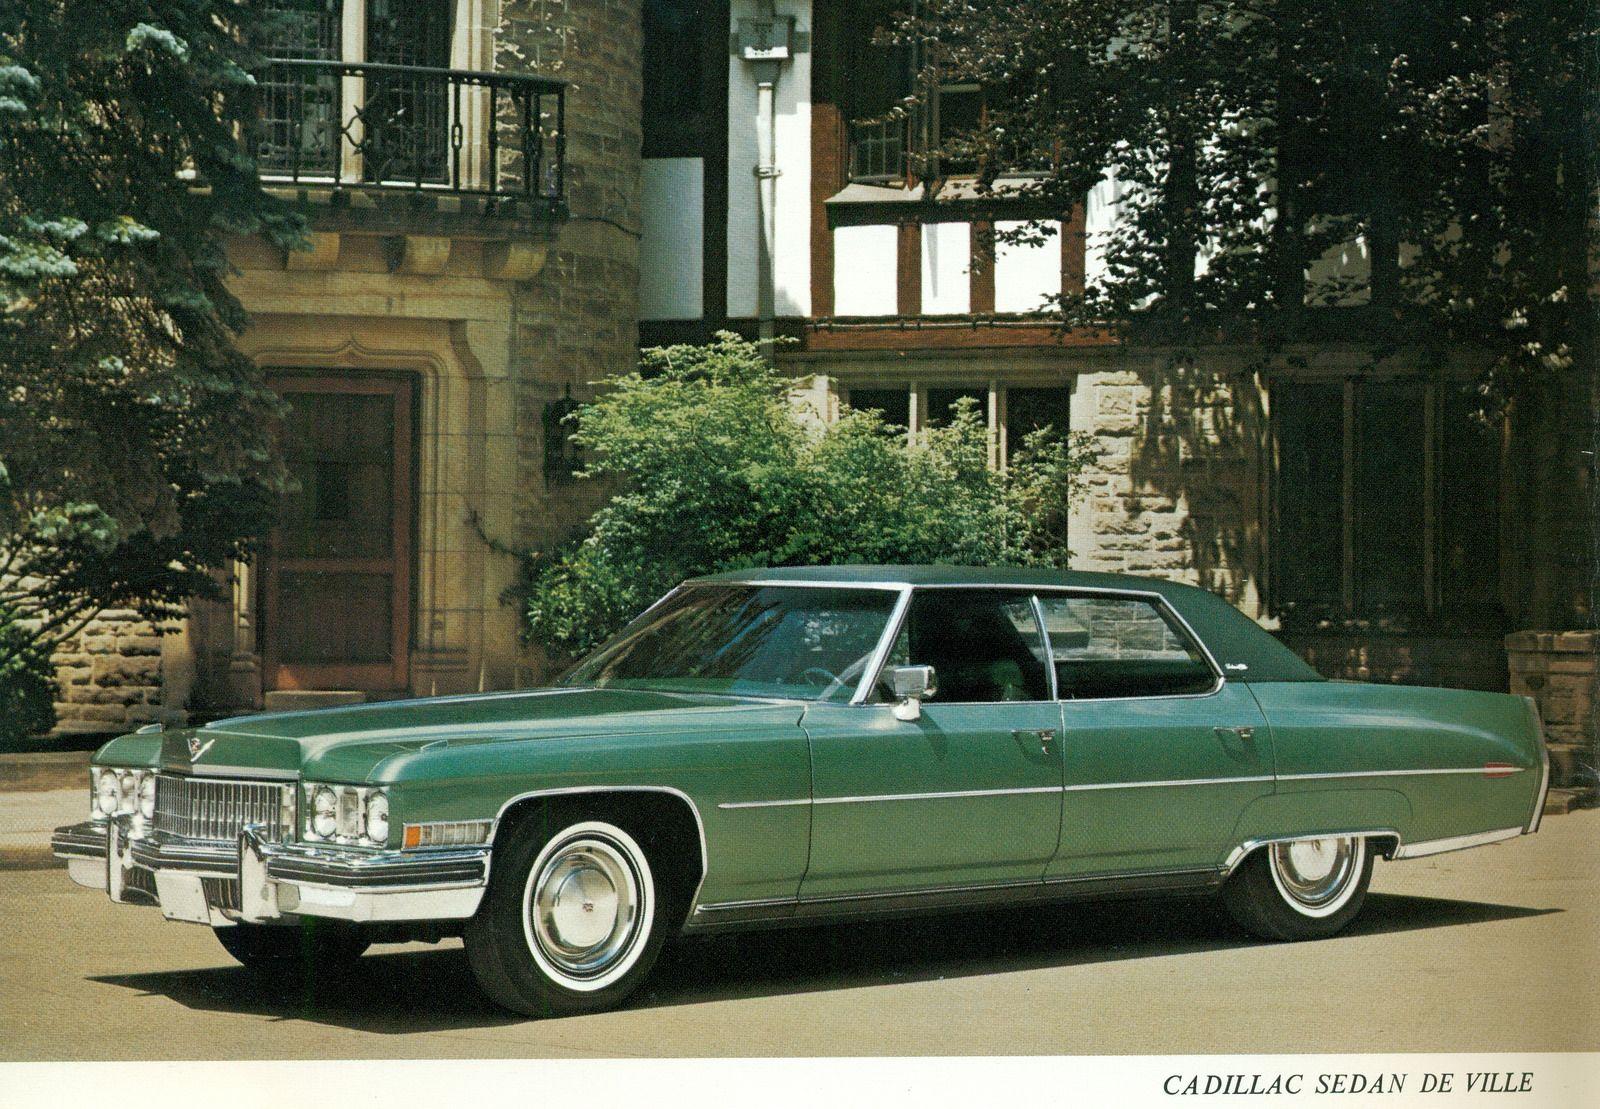 1973 Cadillac Sedan DeVille Green Cars Car Restoration Retro Cars Vintage Cars